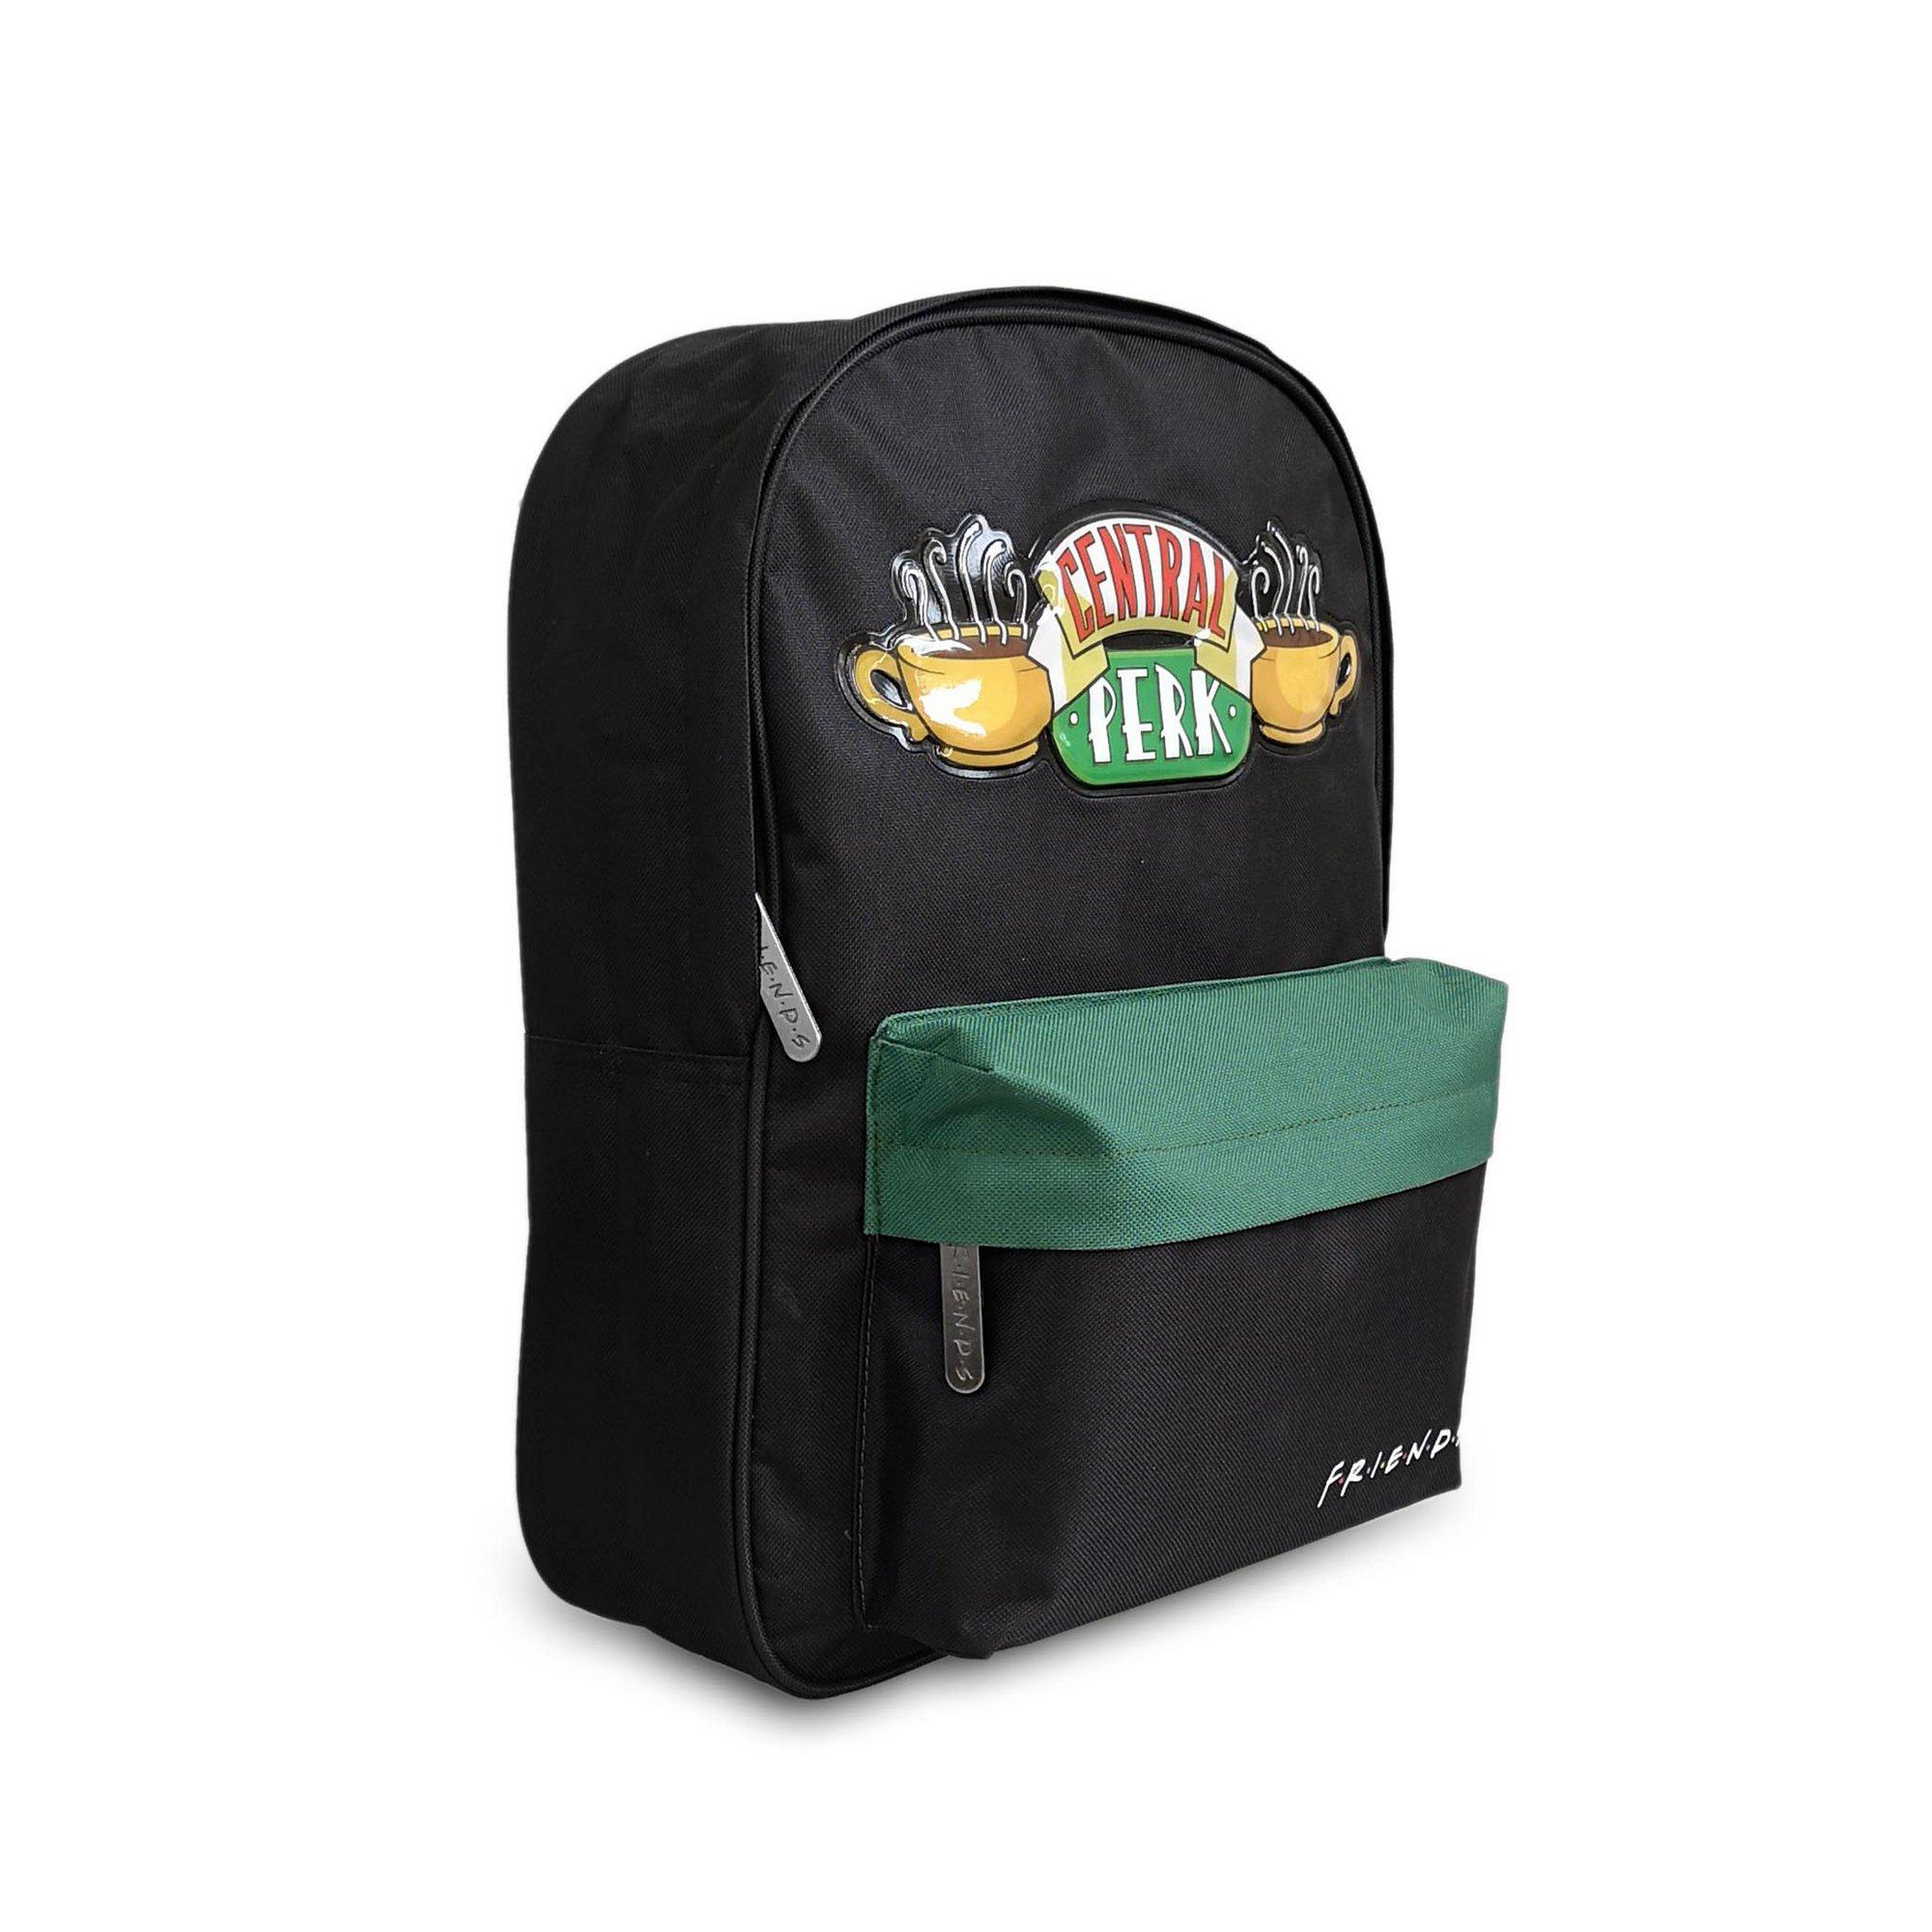 Image of Central Perk Embossed Friends BTS Backpack